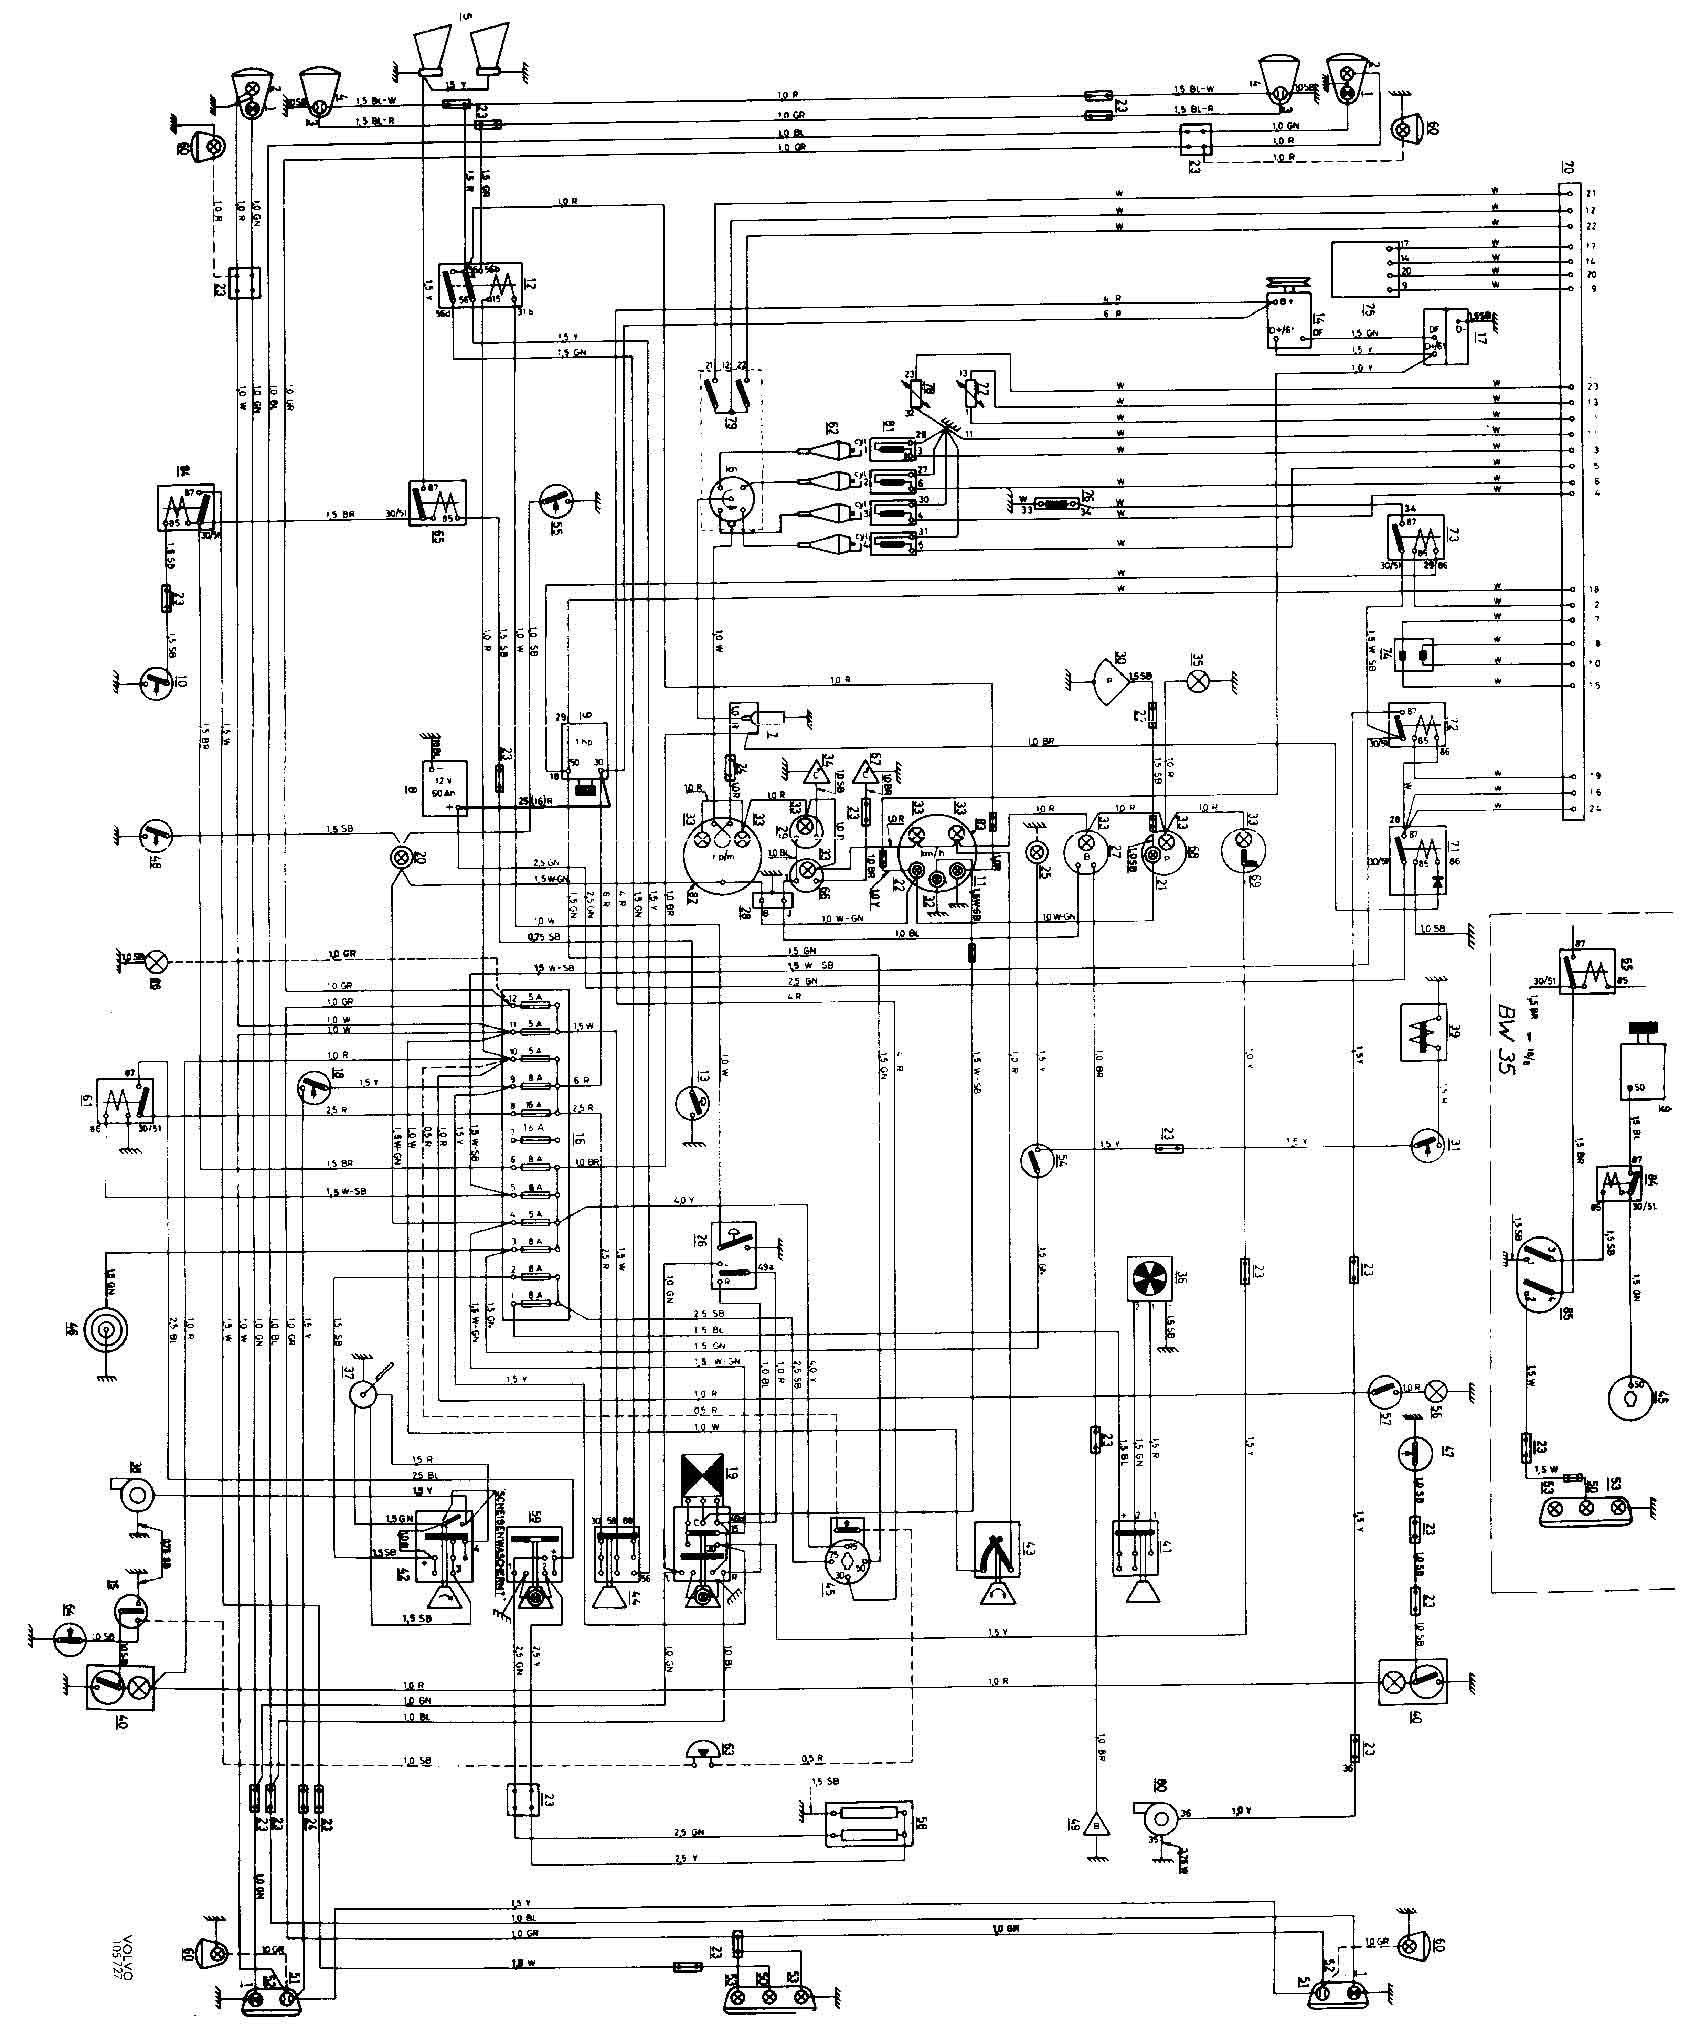 s40 wiring diagram ks 2230  wiring diagram additionally 2015 volvo s80 on volvo  wiring diagram additionally 2015 volvo